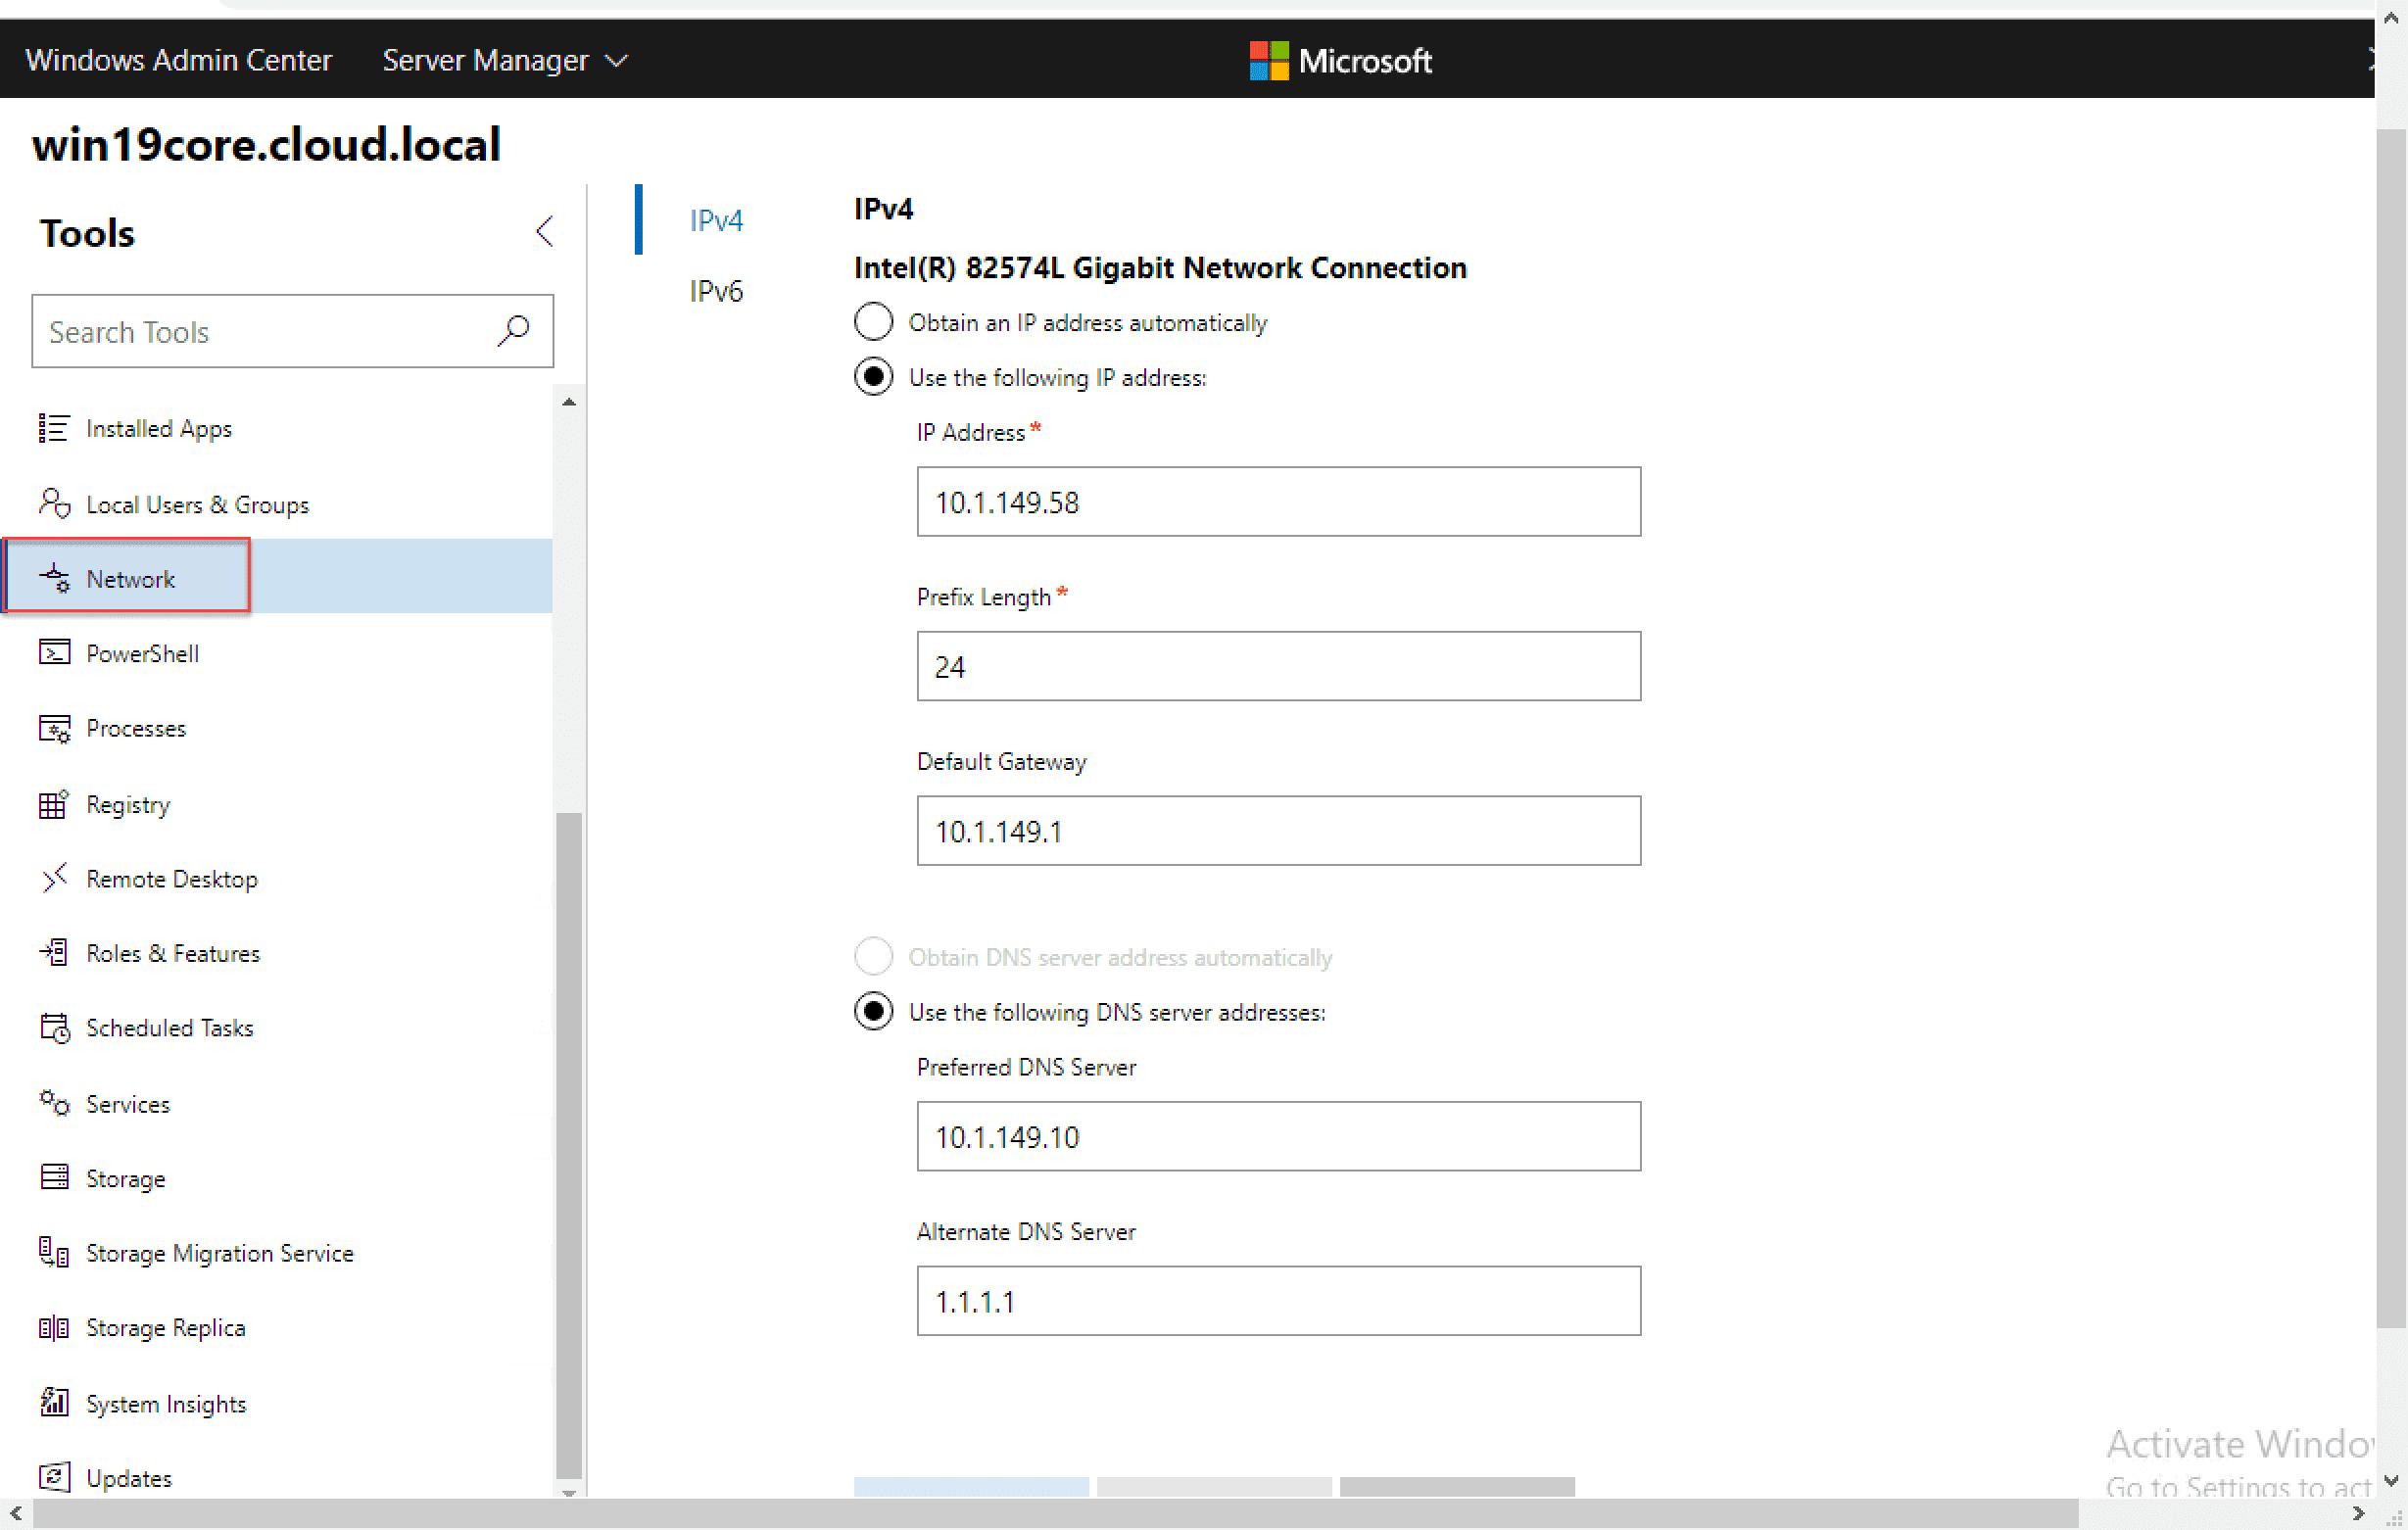 Configure-network-settings-on-Windows-Server-2019-Core-with-Windows-Admin-Center